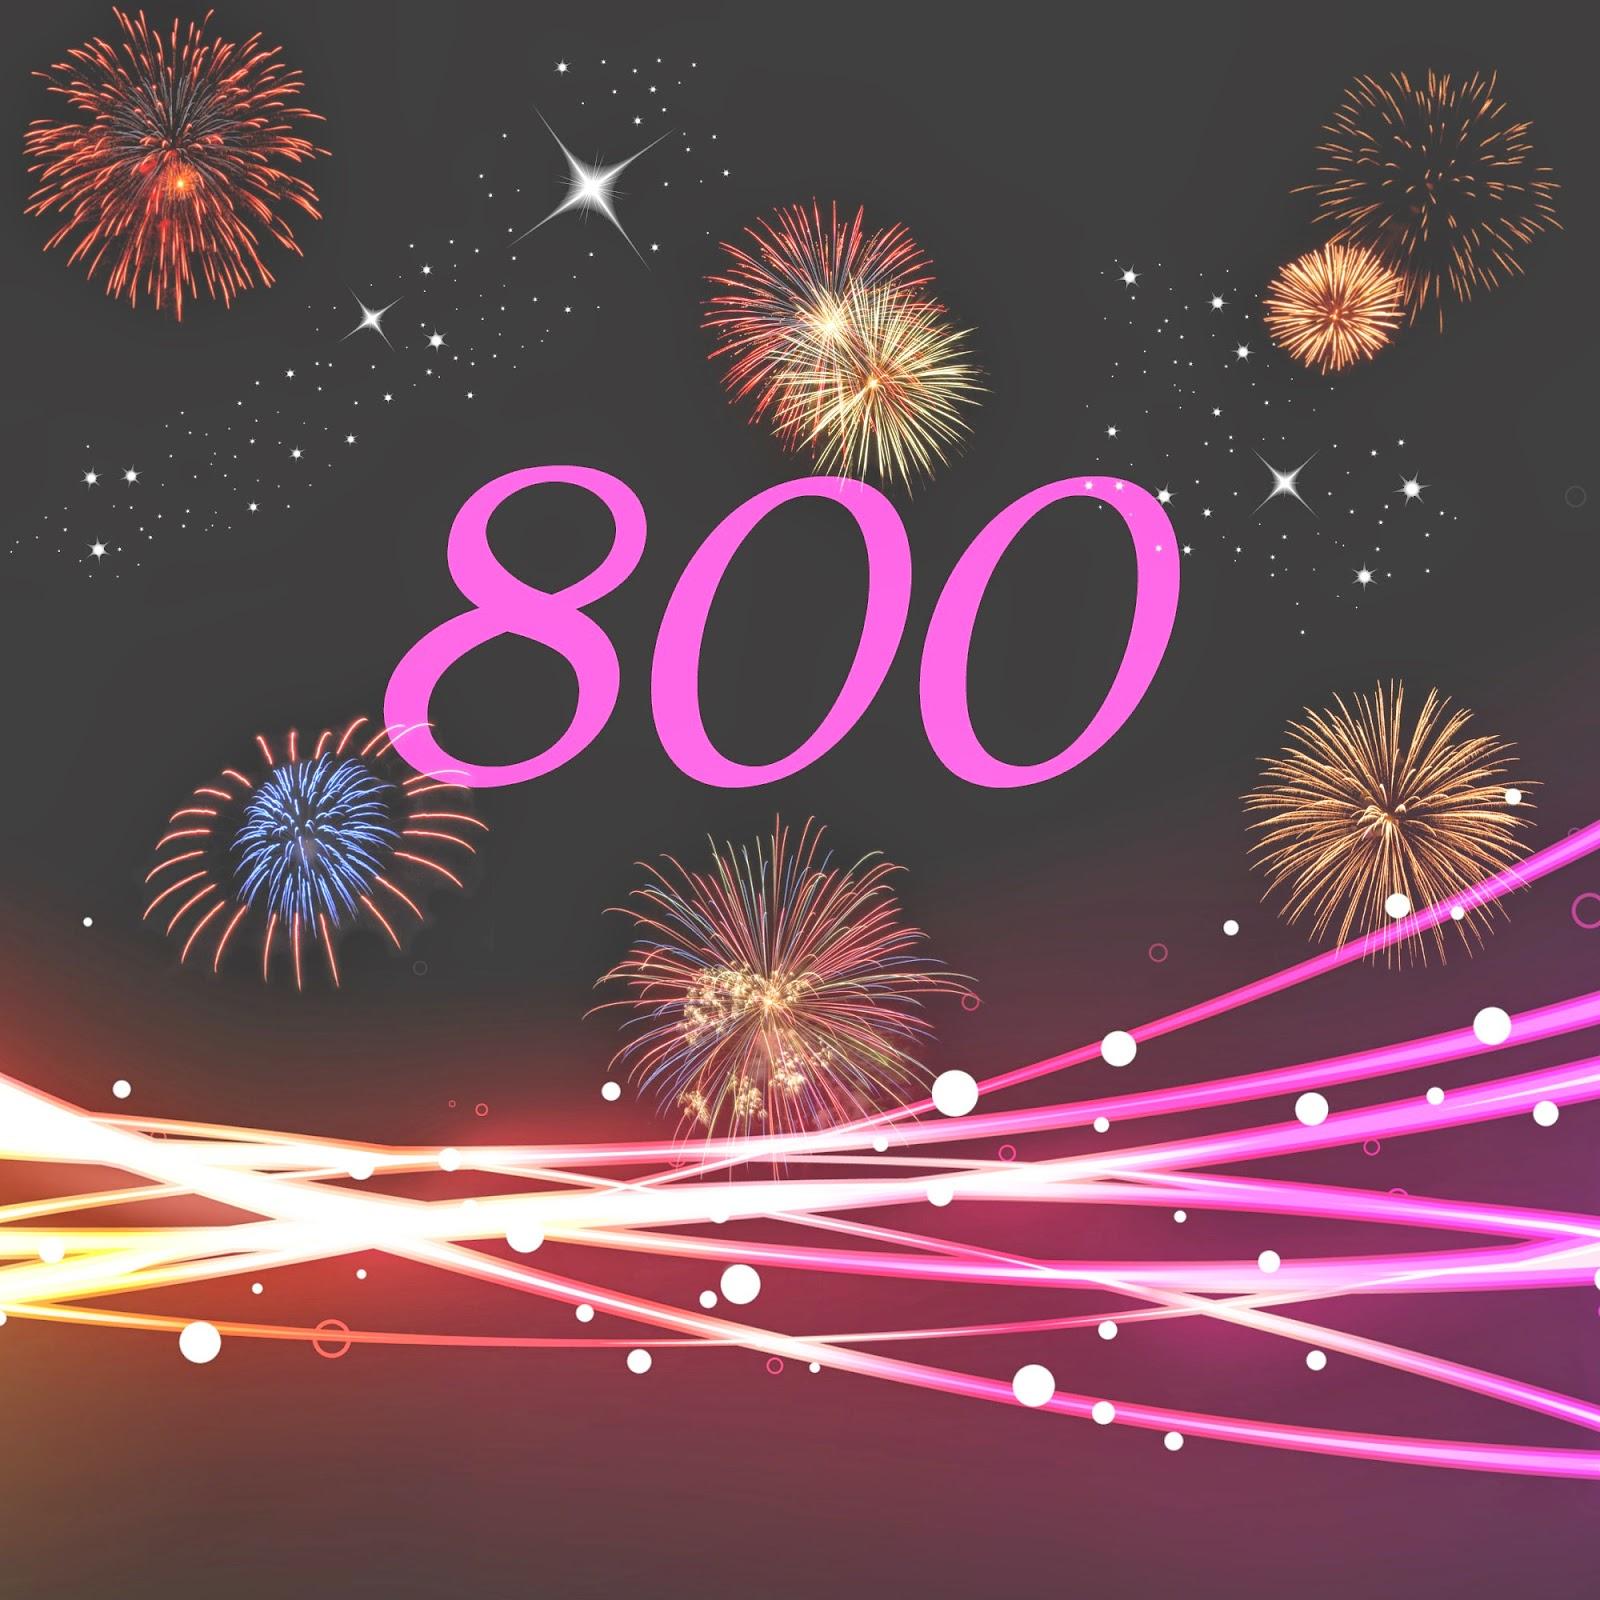 Crochetkari 800 facebook likes